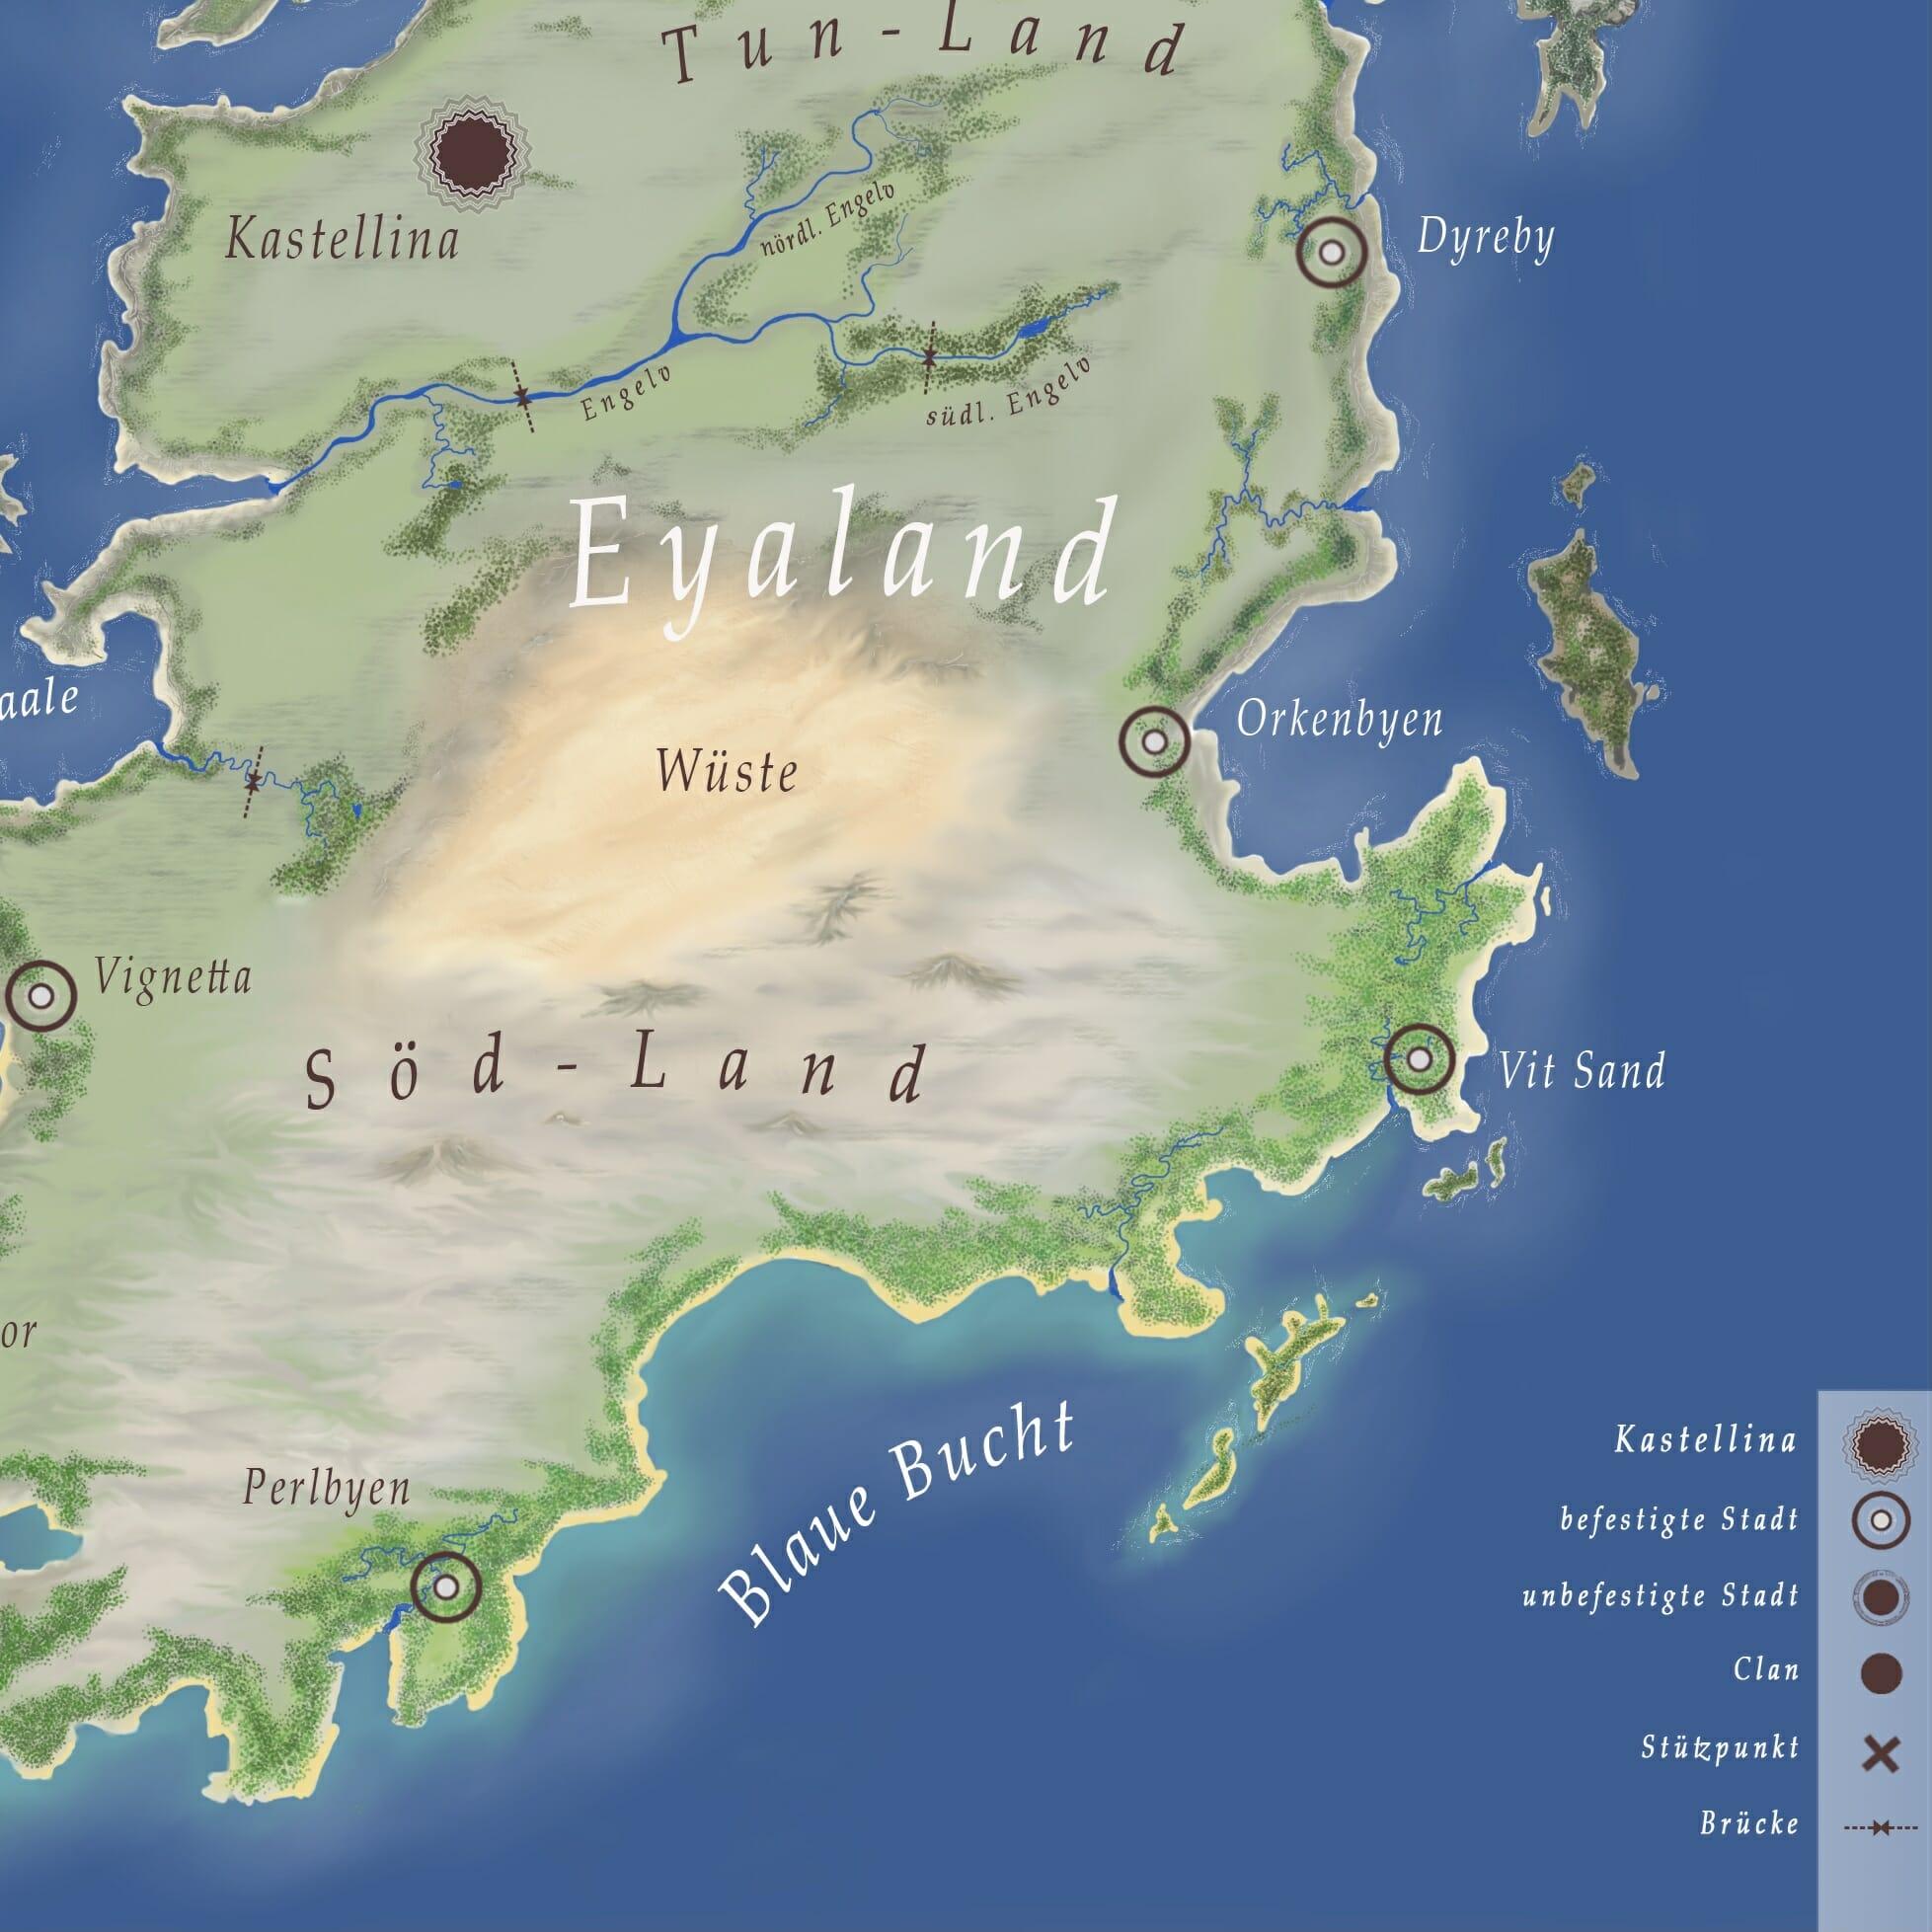 Kartenausschnitt Eyaland - Zoe S. Rosary